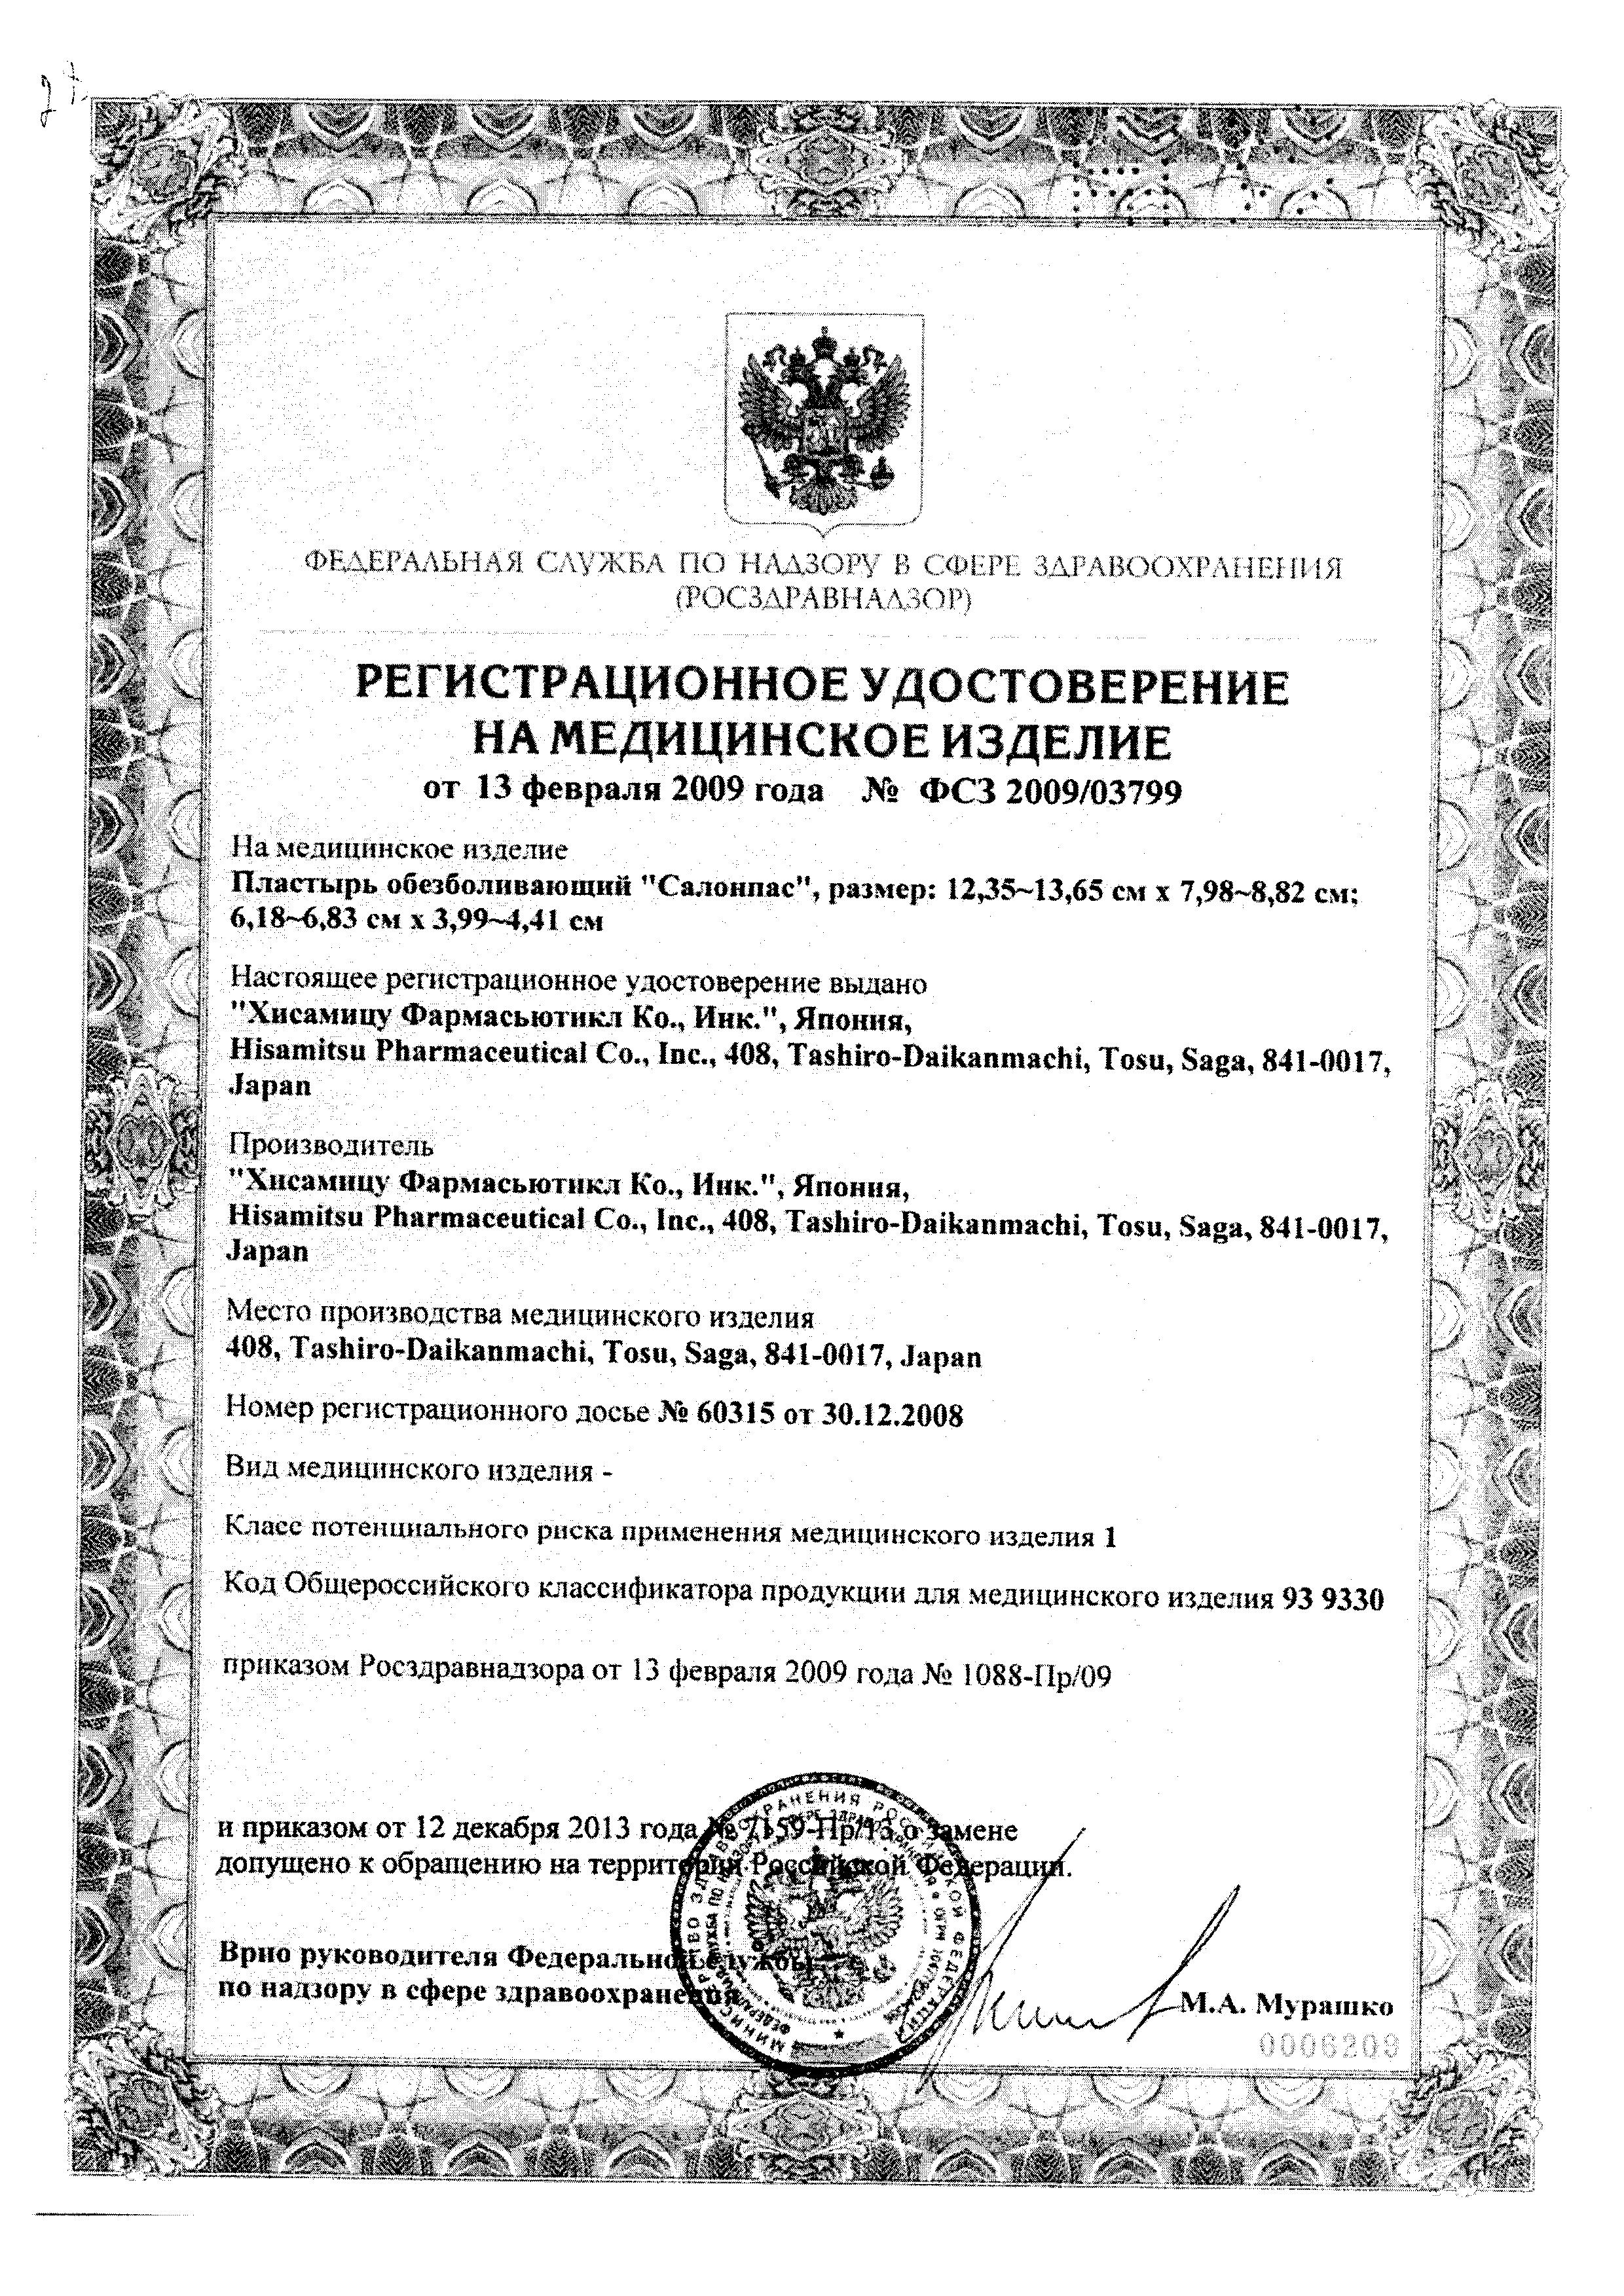 Salonpas пластырь обезболивающий сертификат